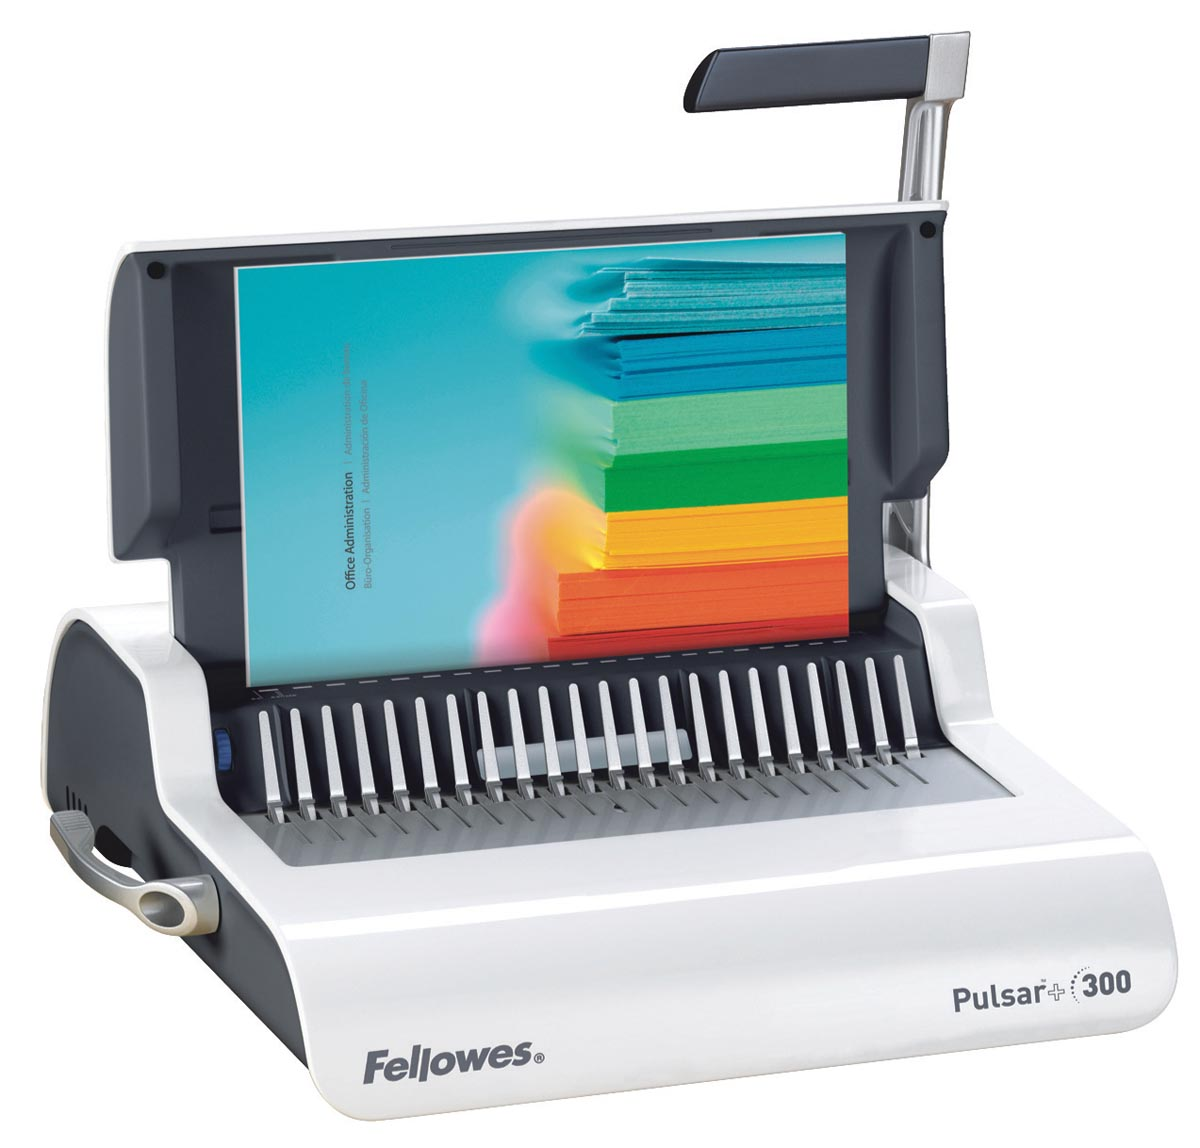 Fellowes manuele inbindmachine Pulsar +300